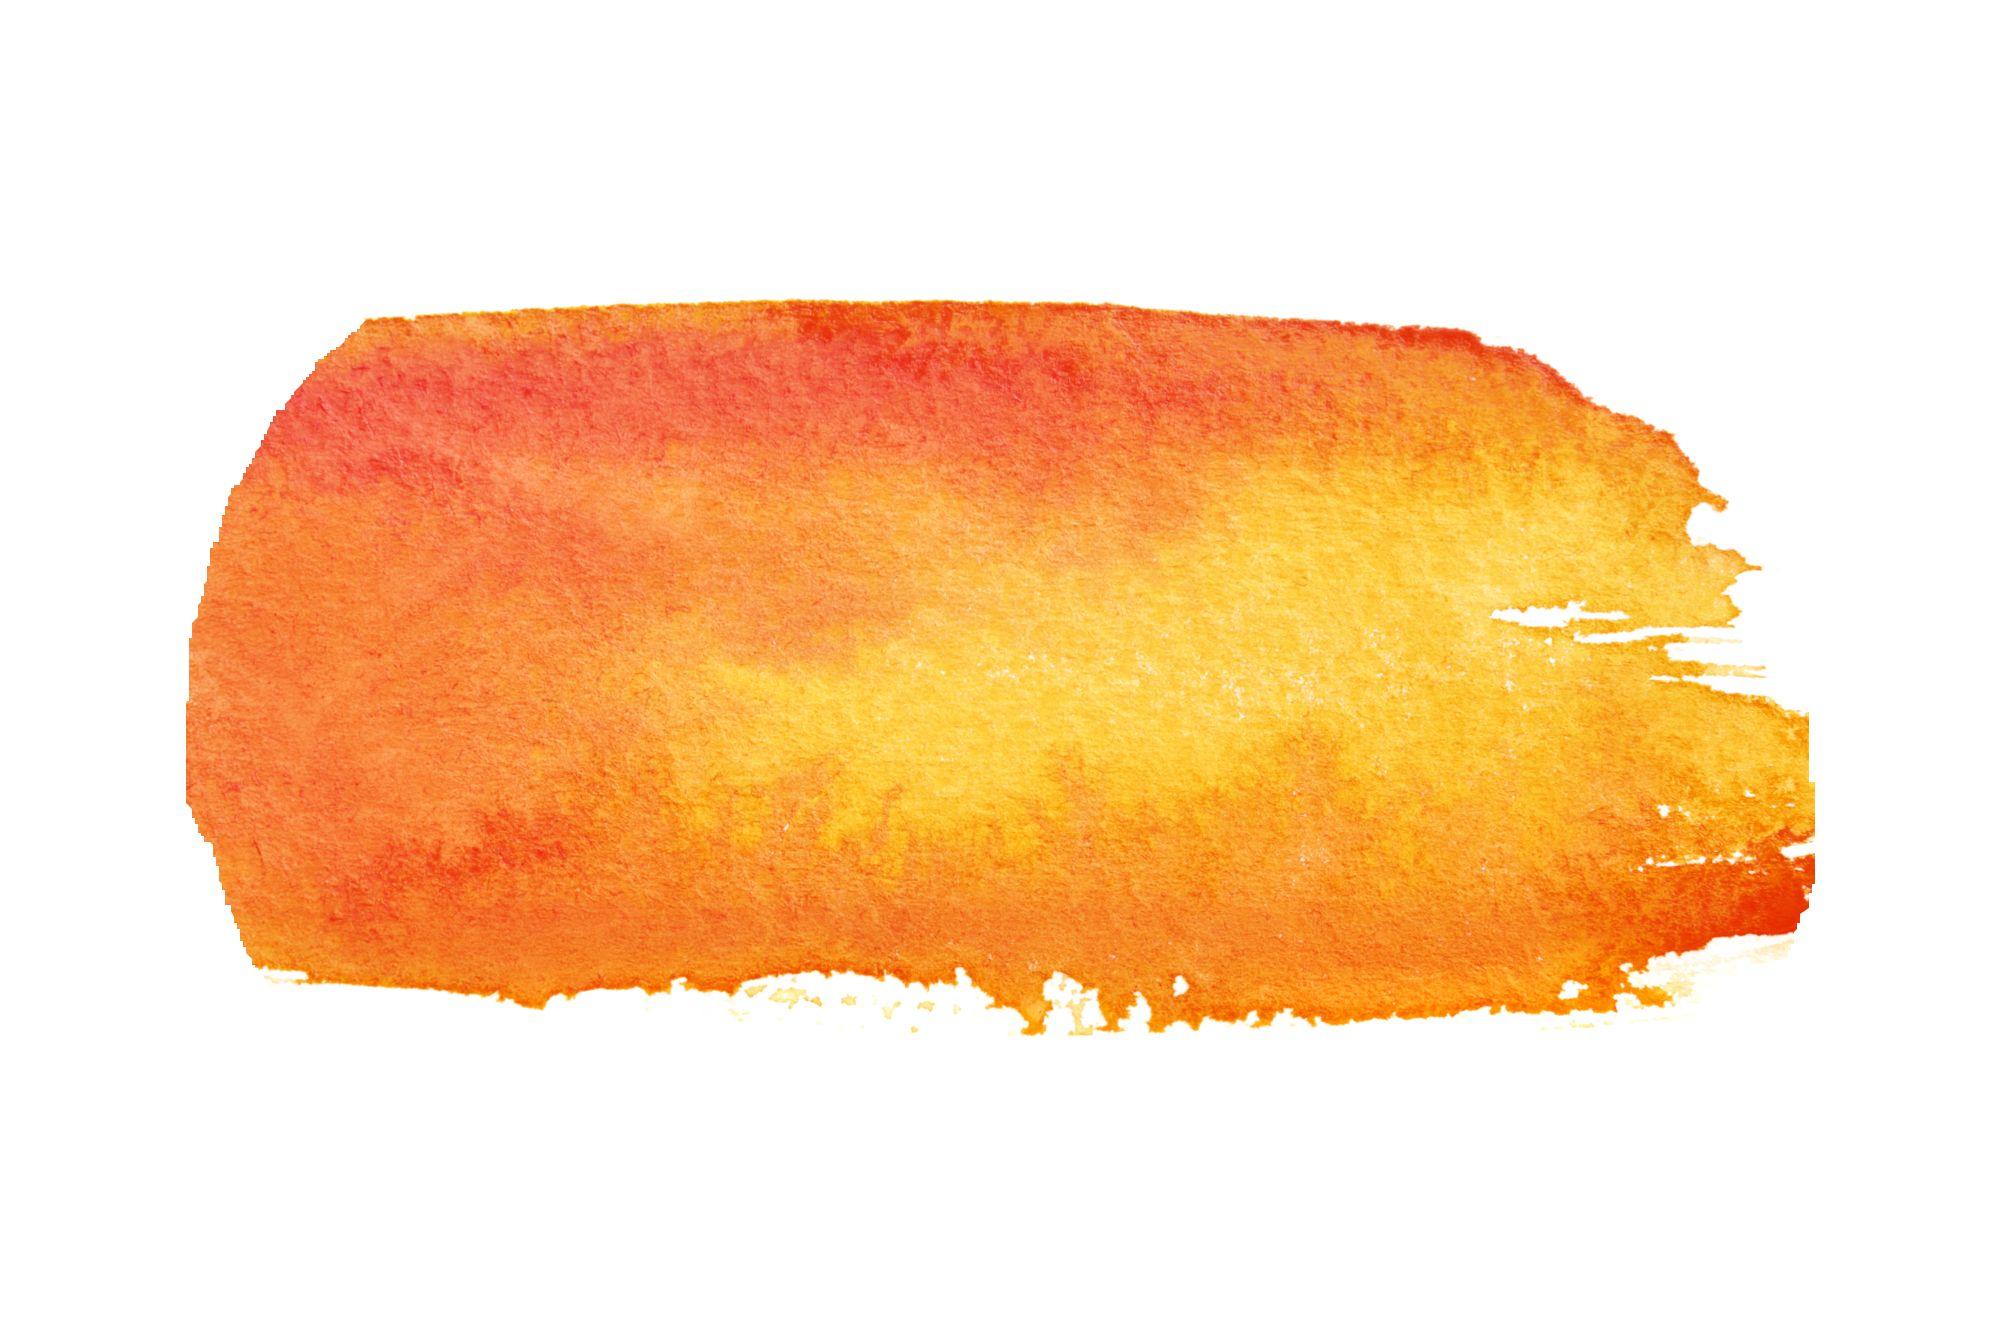 Orange Banner 2 Jpg 2000 1333 Watercolor Splash Orange Watercolor Texture